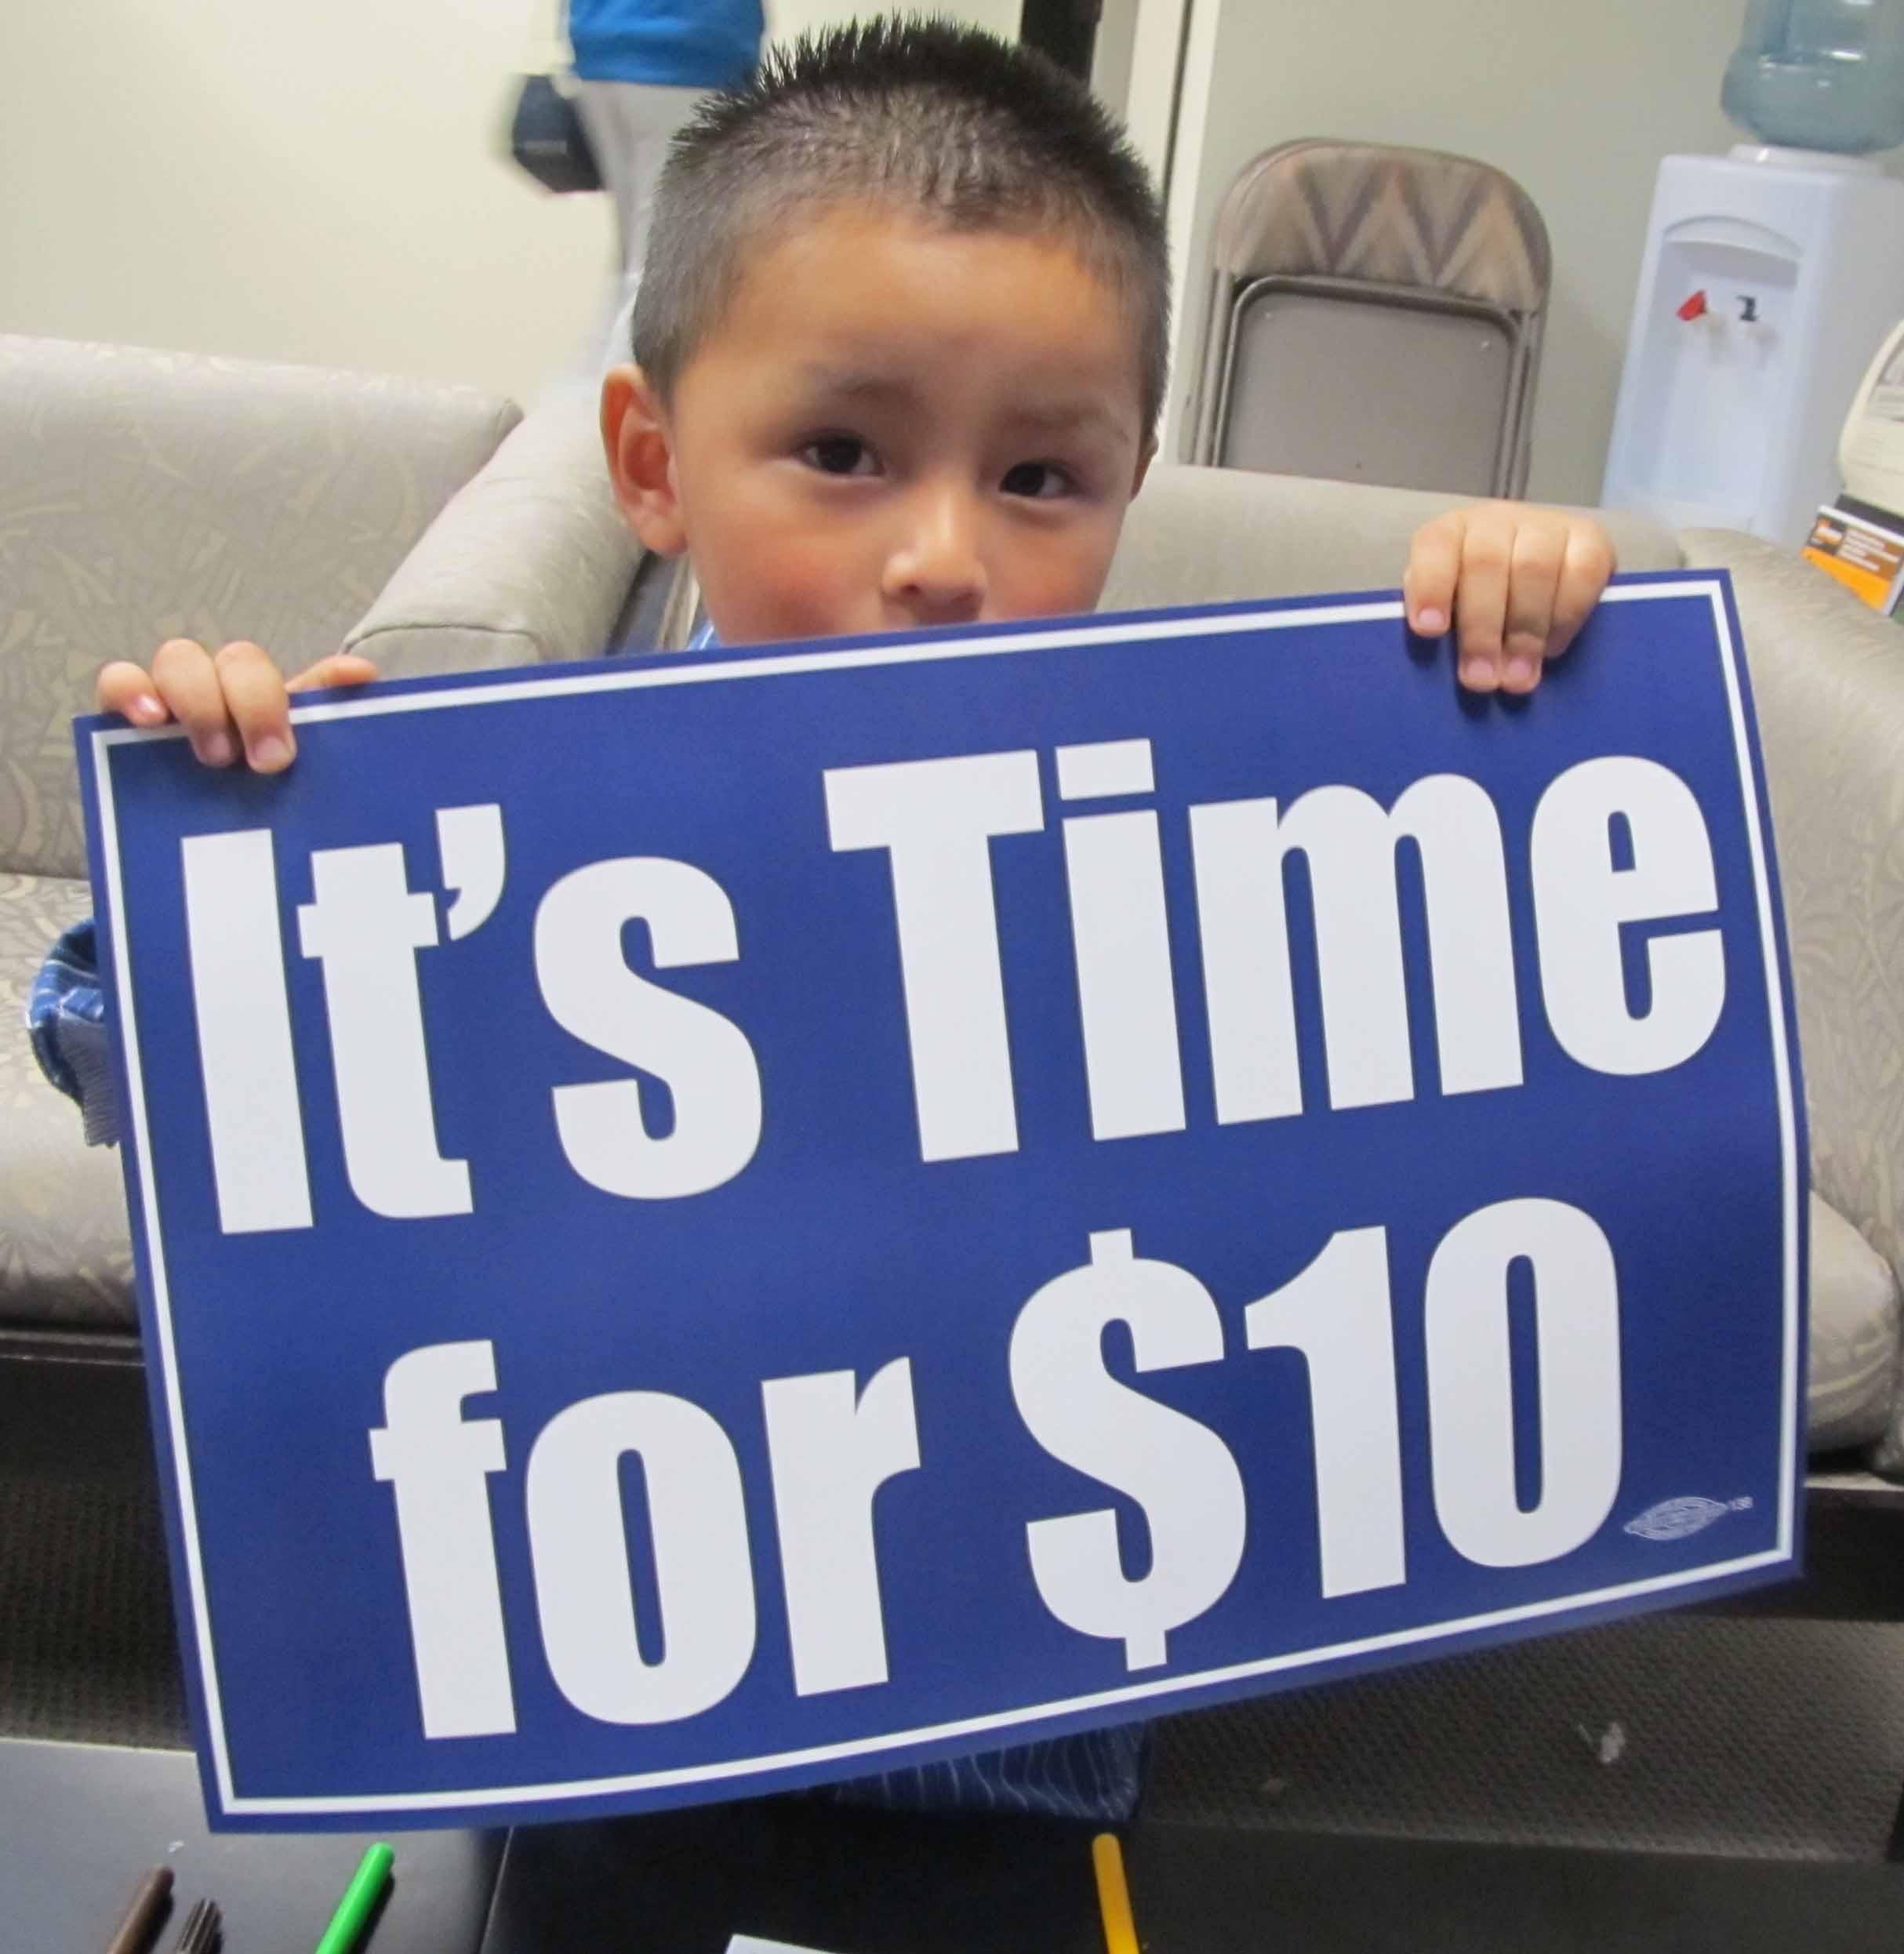 Minimum wage subject to raise to $10